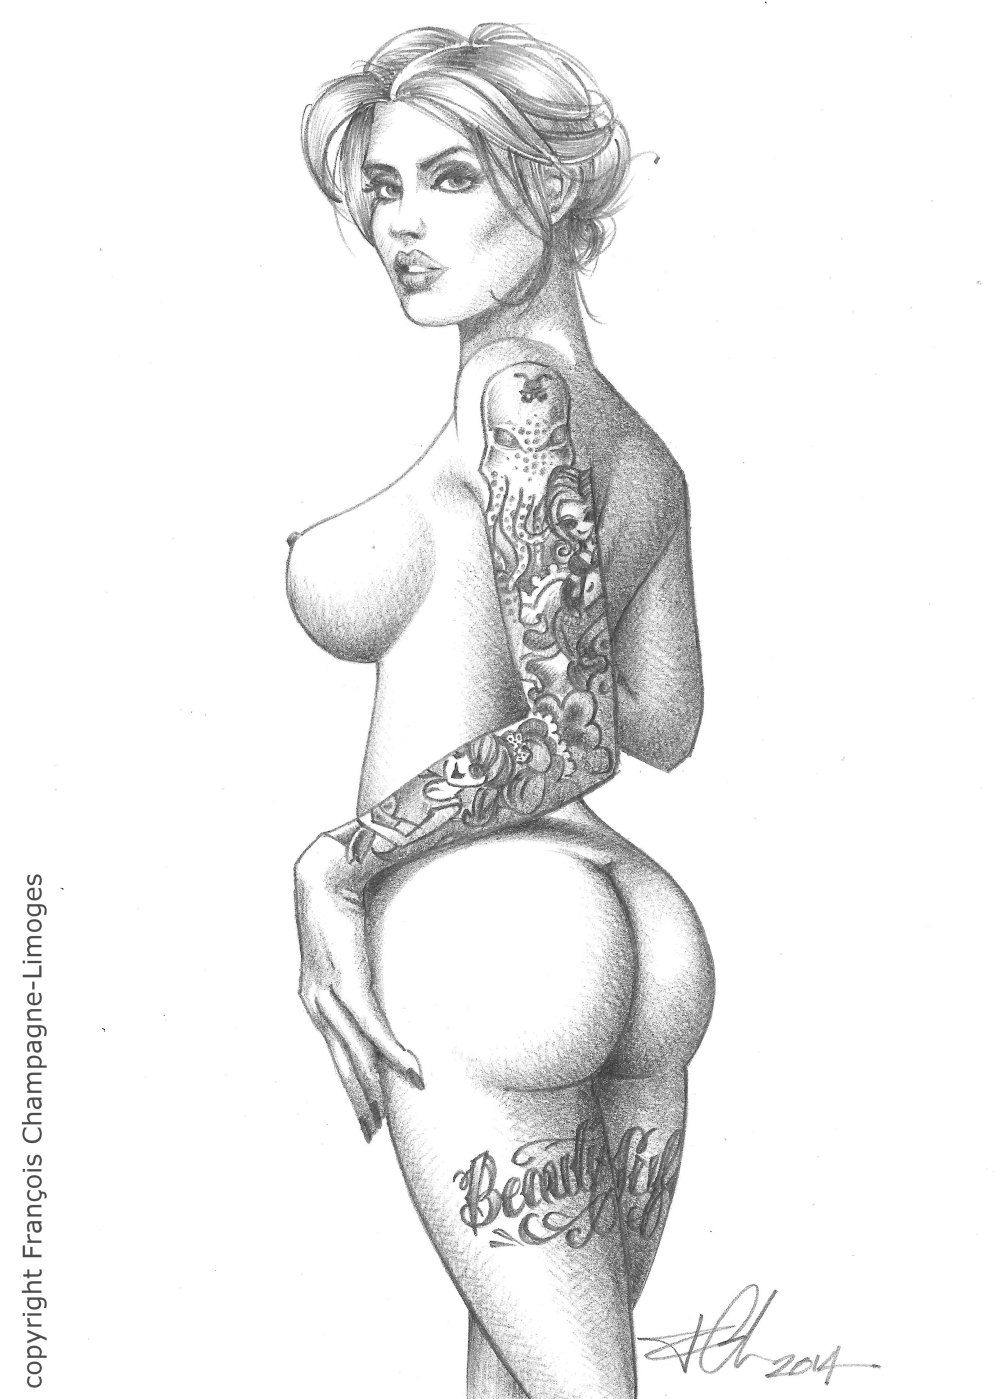 Sketch_600dpi (12)